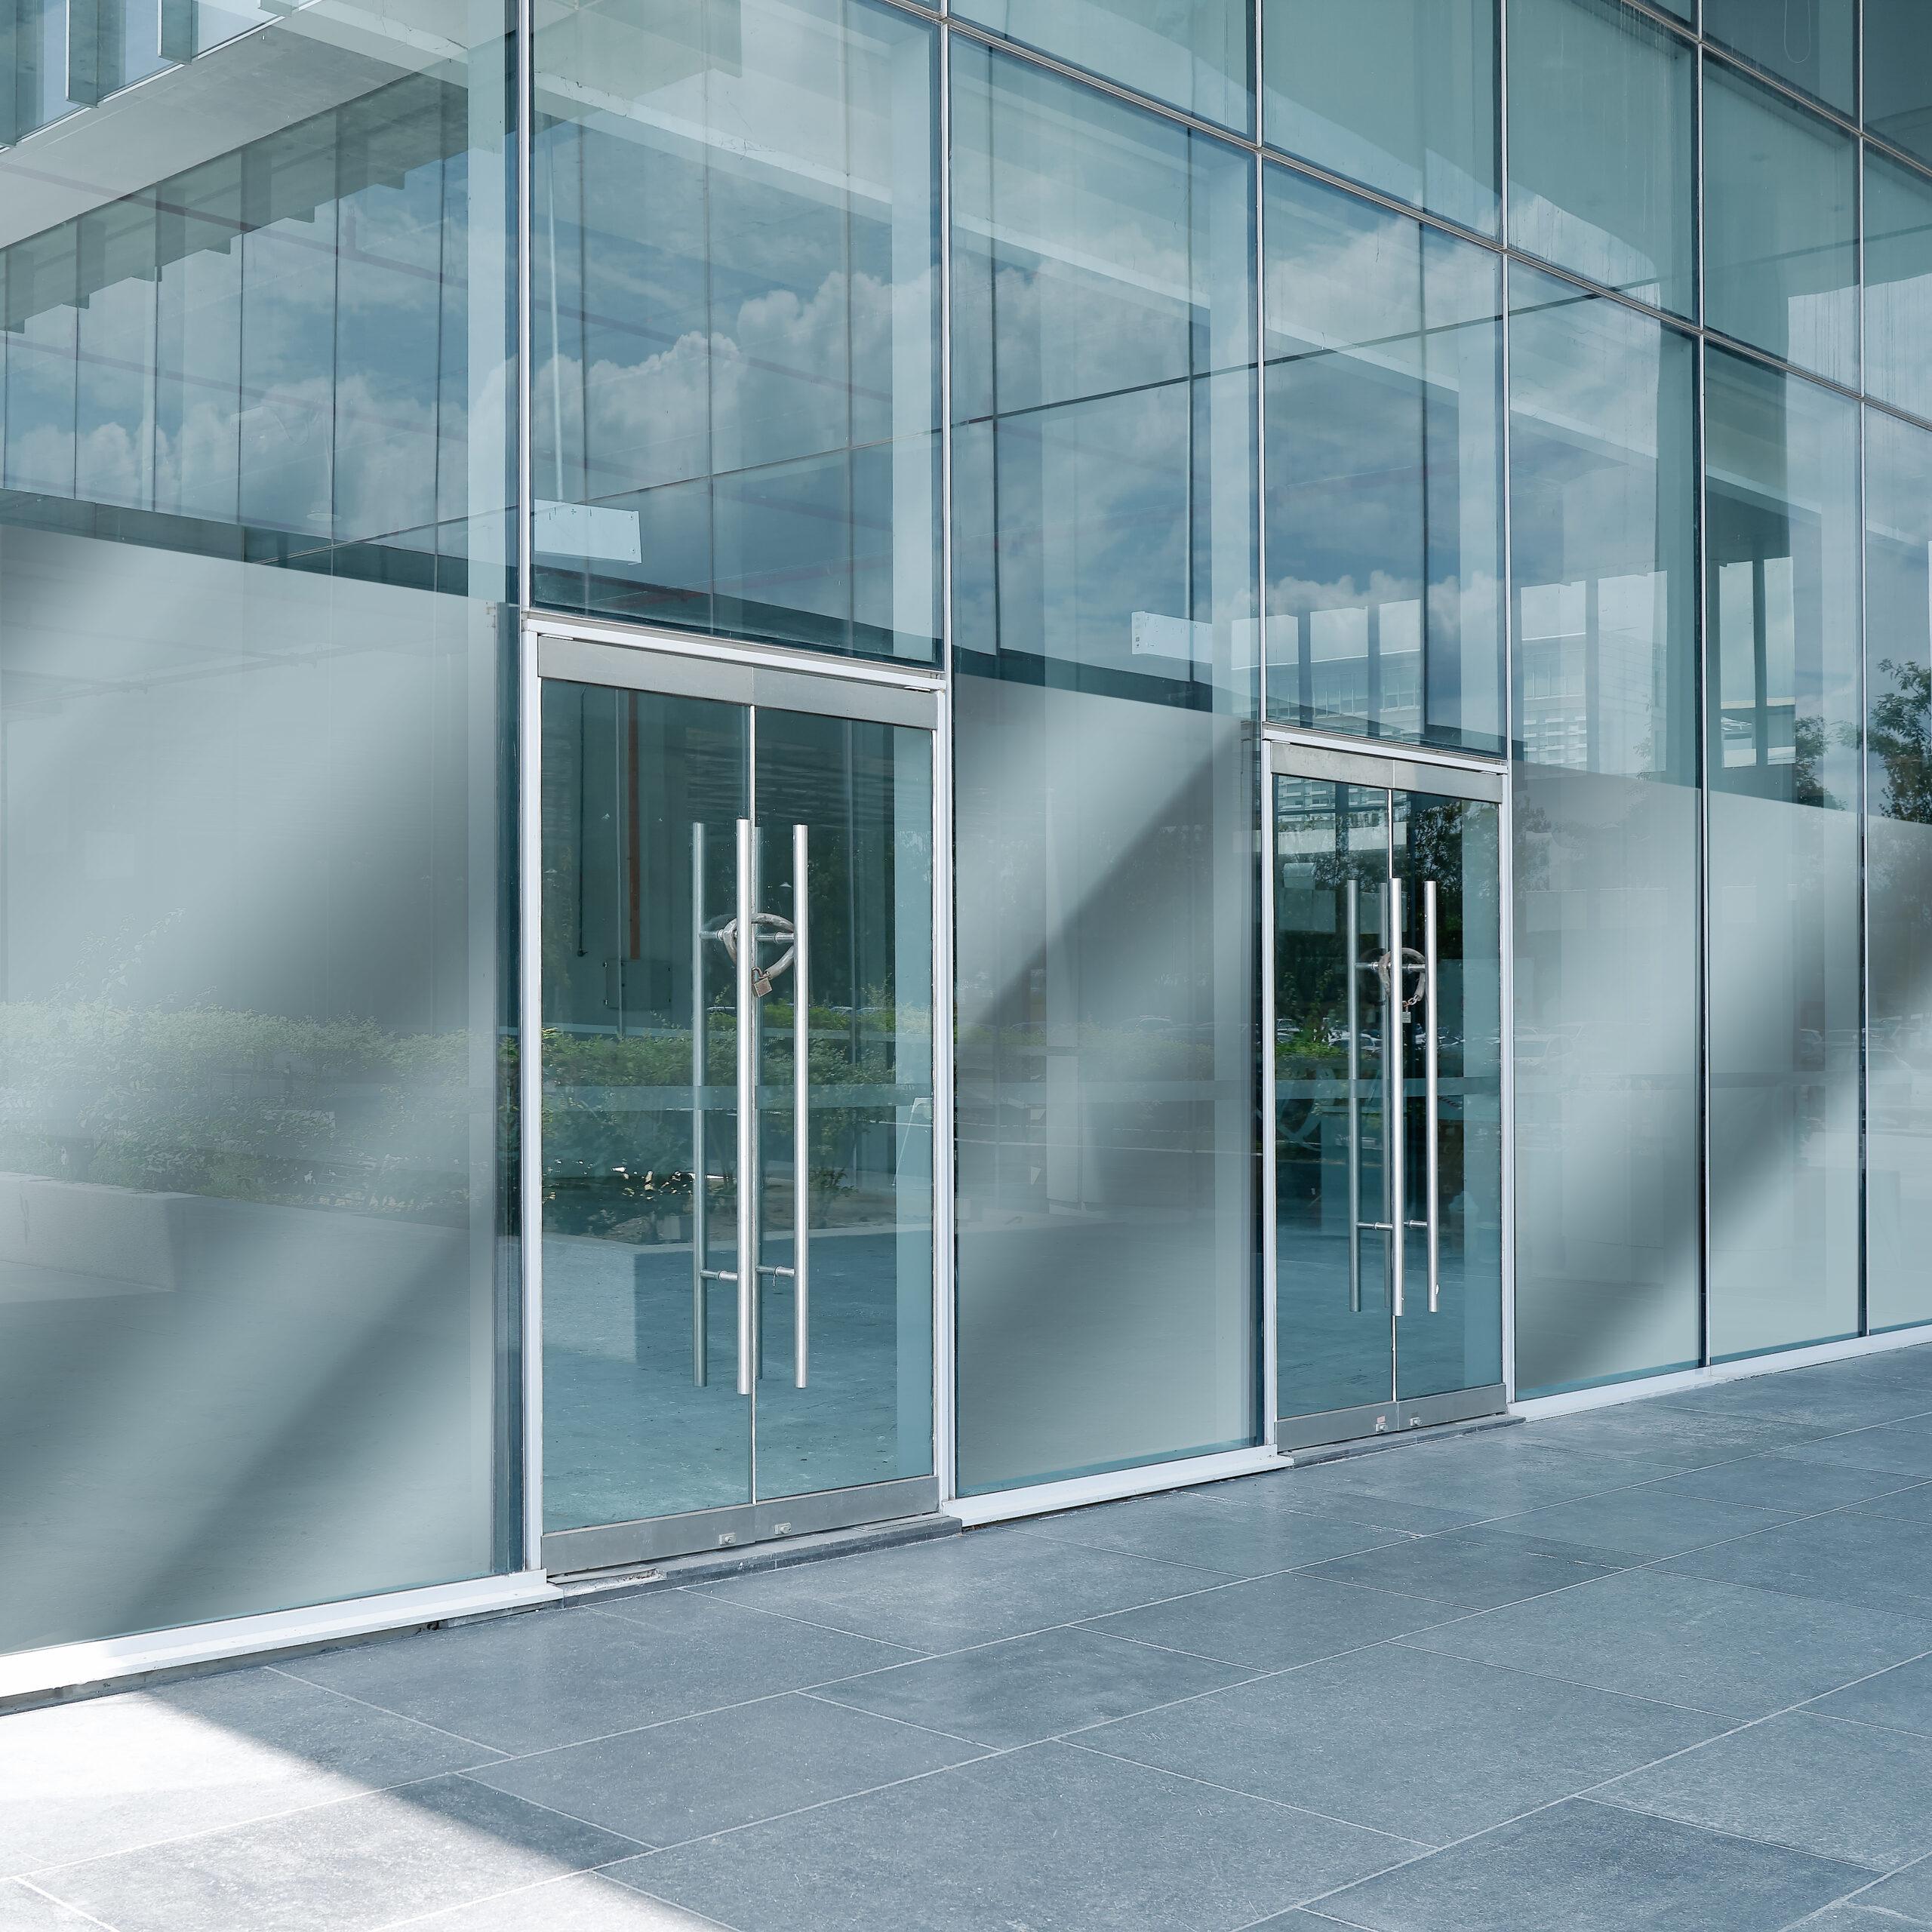 Speilfilm montert på vinduersfasade.